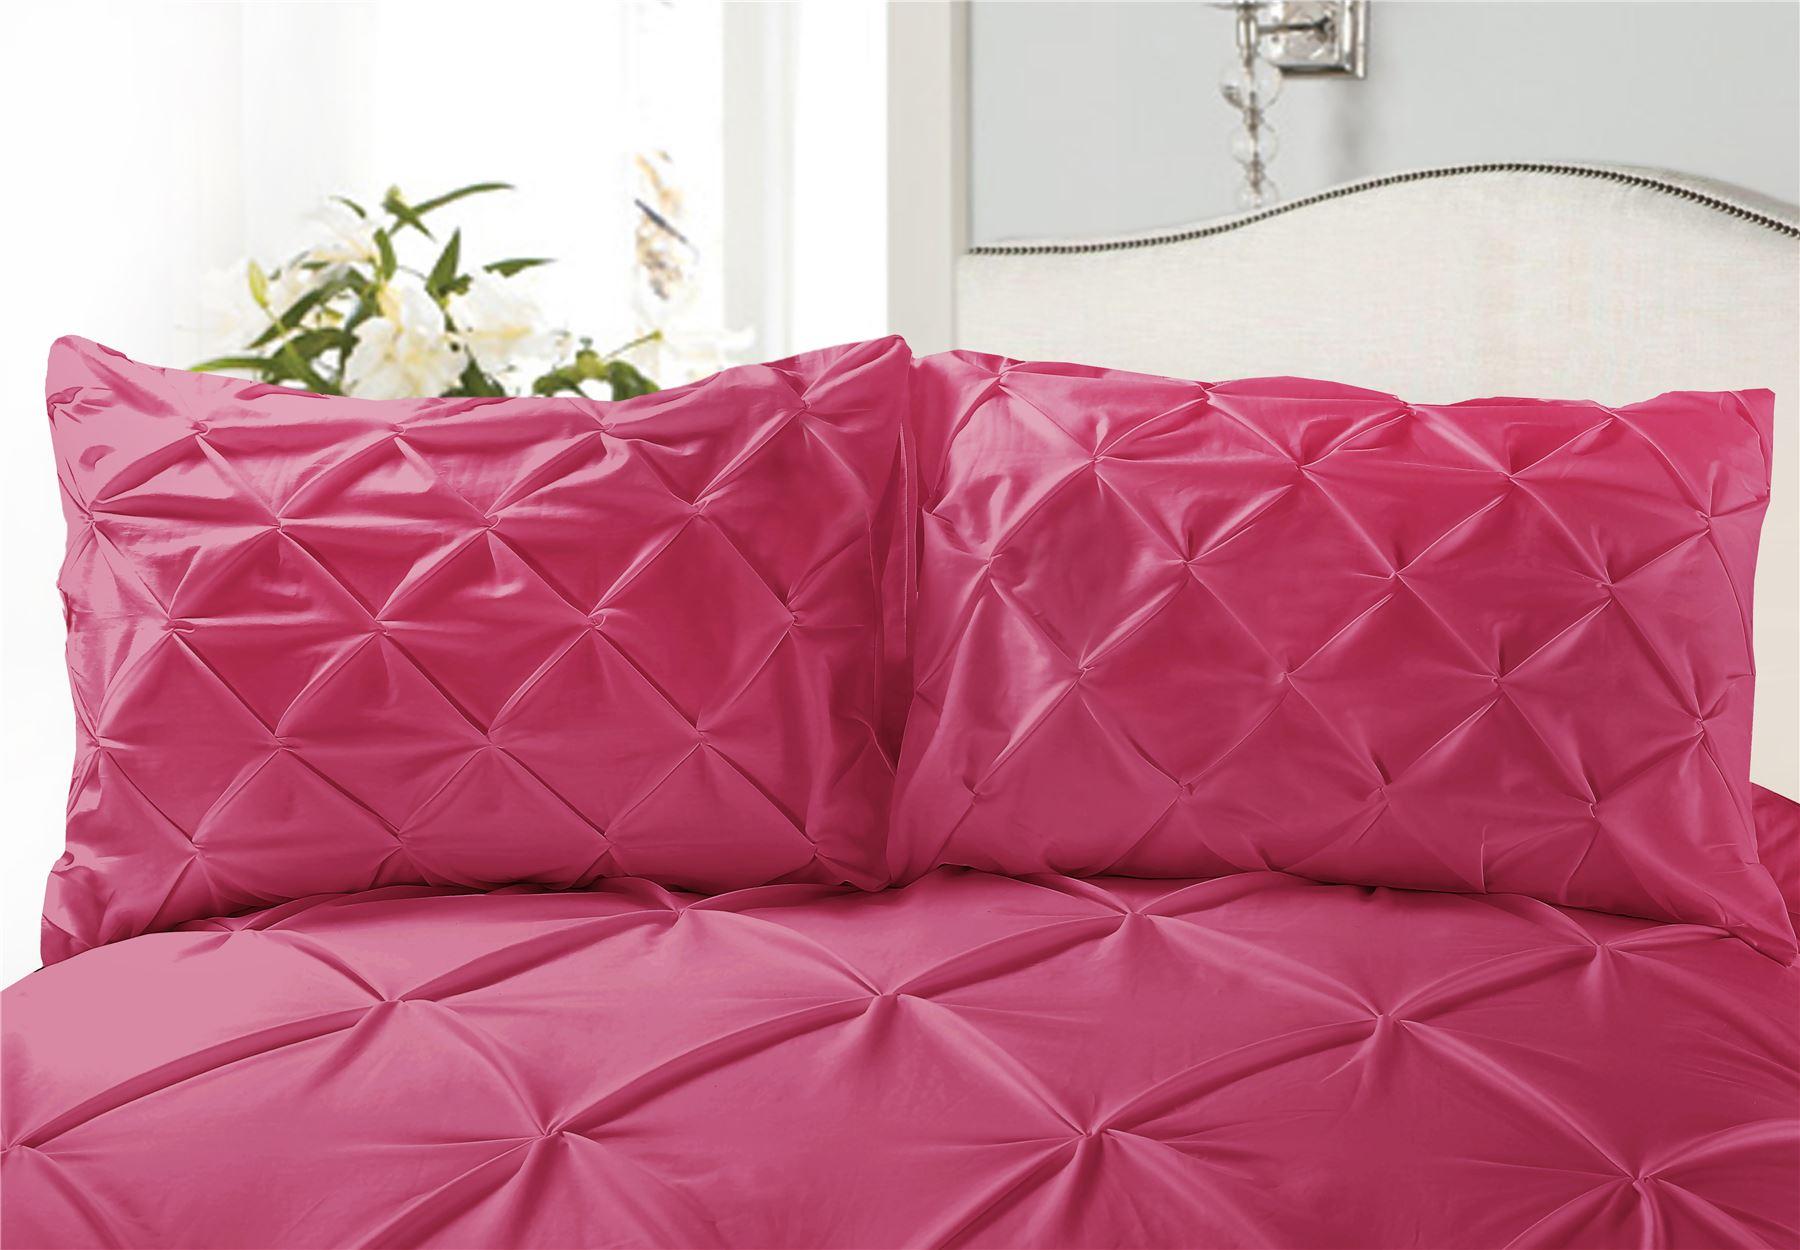 Luxury-Pure-100-Cotton-200-Thread-Pinch-Pleat-Pintuck-Puckering-Duvet-Cover-Set thumbnail 34